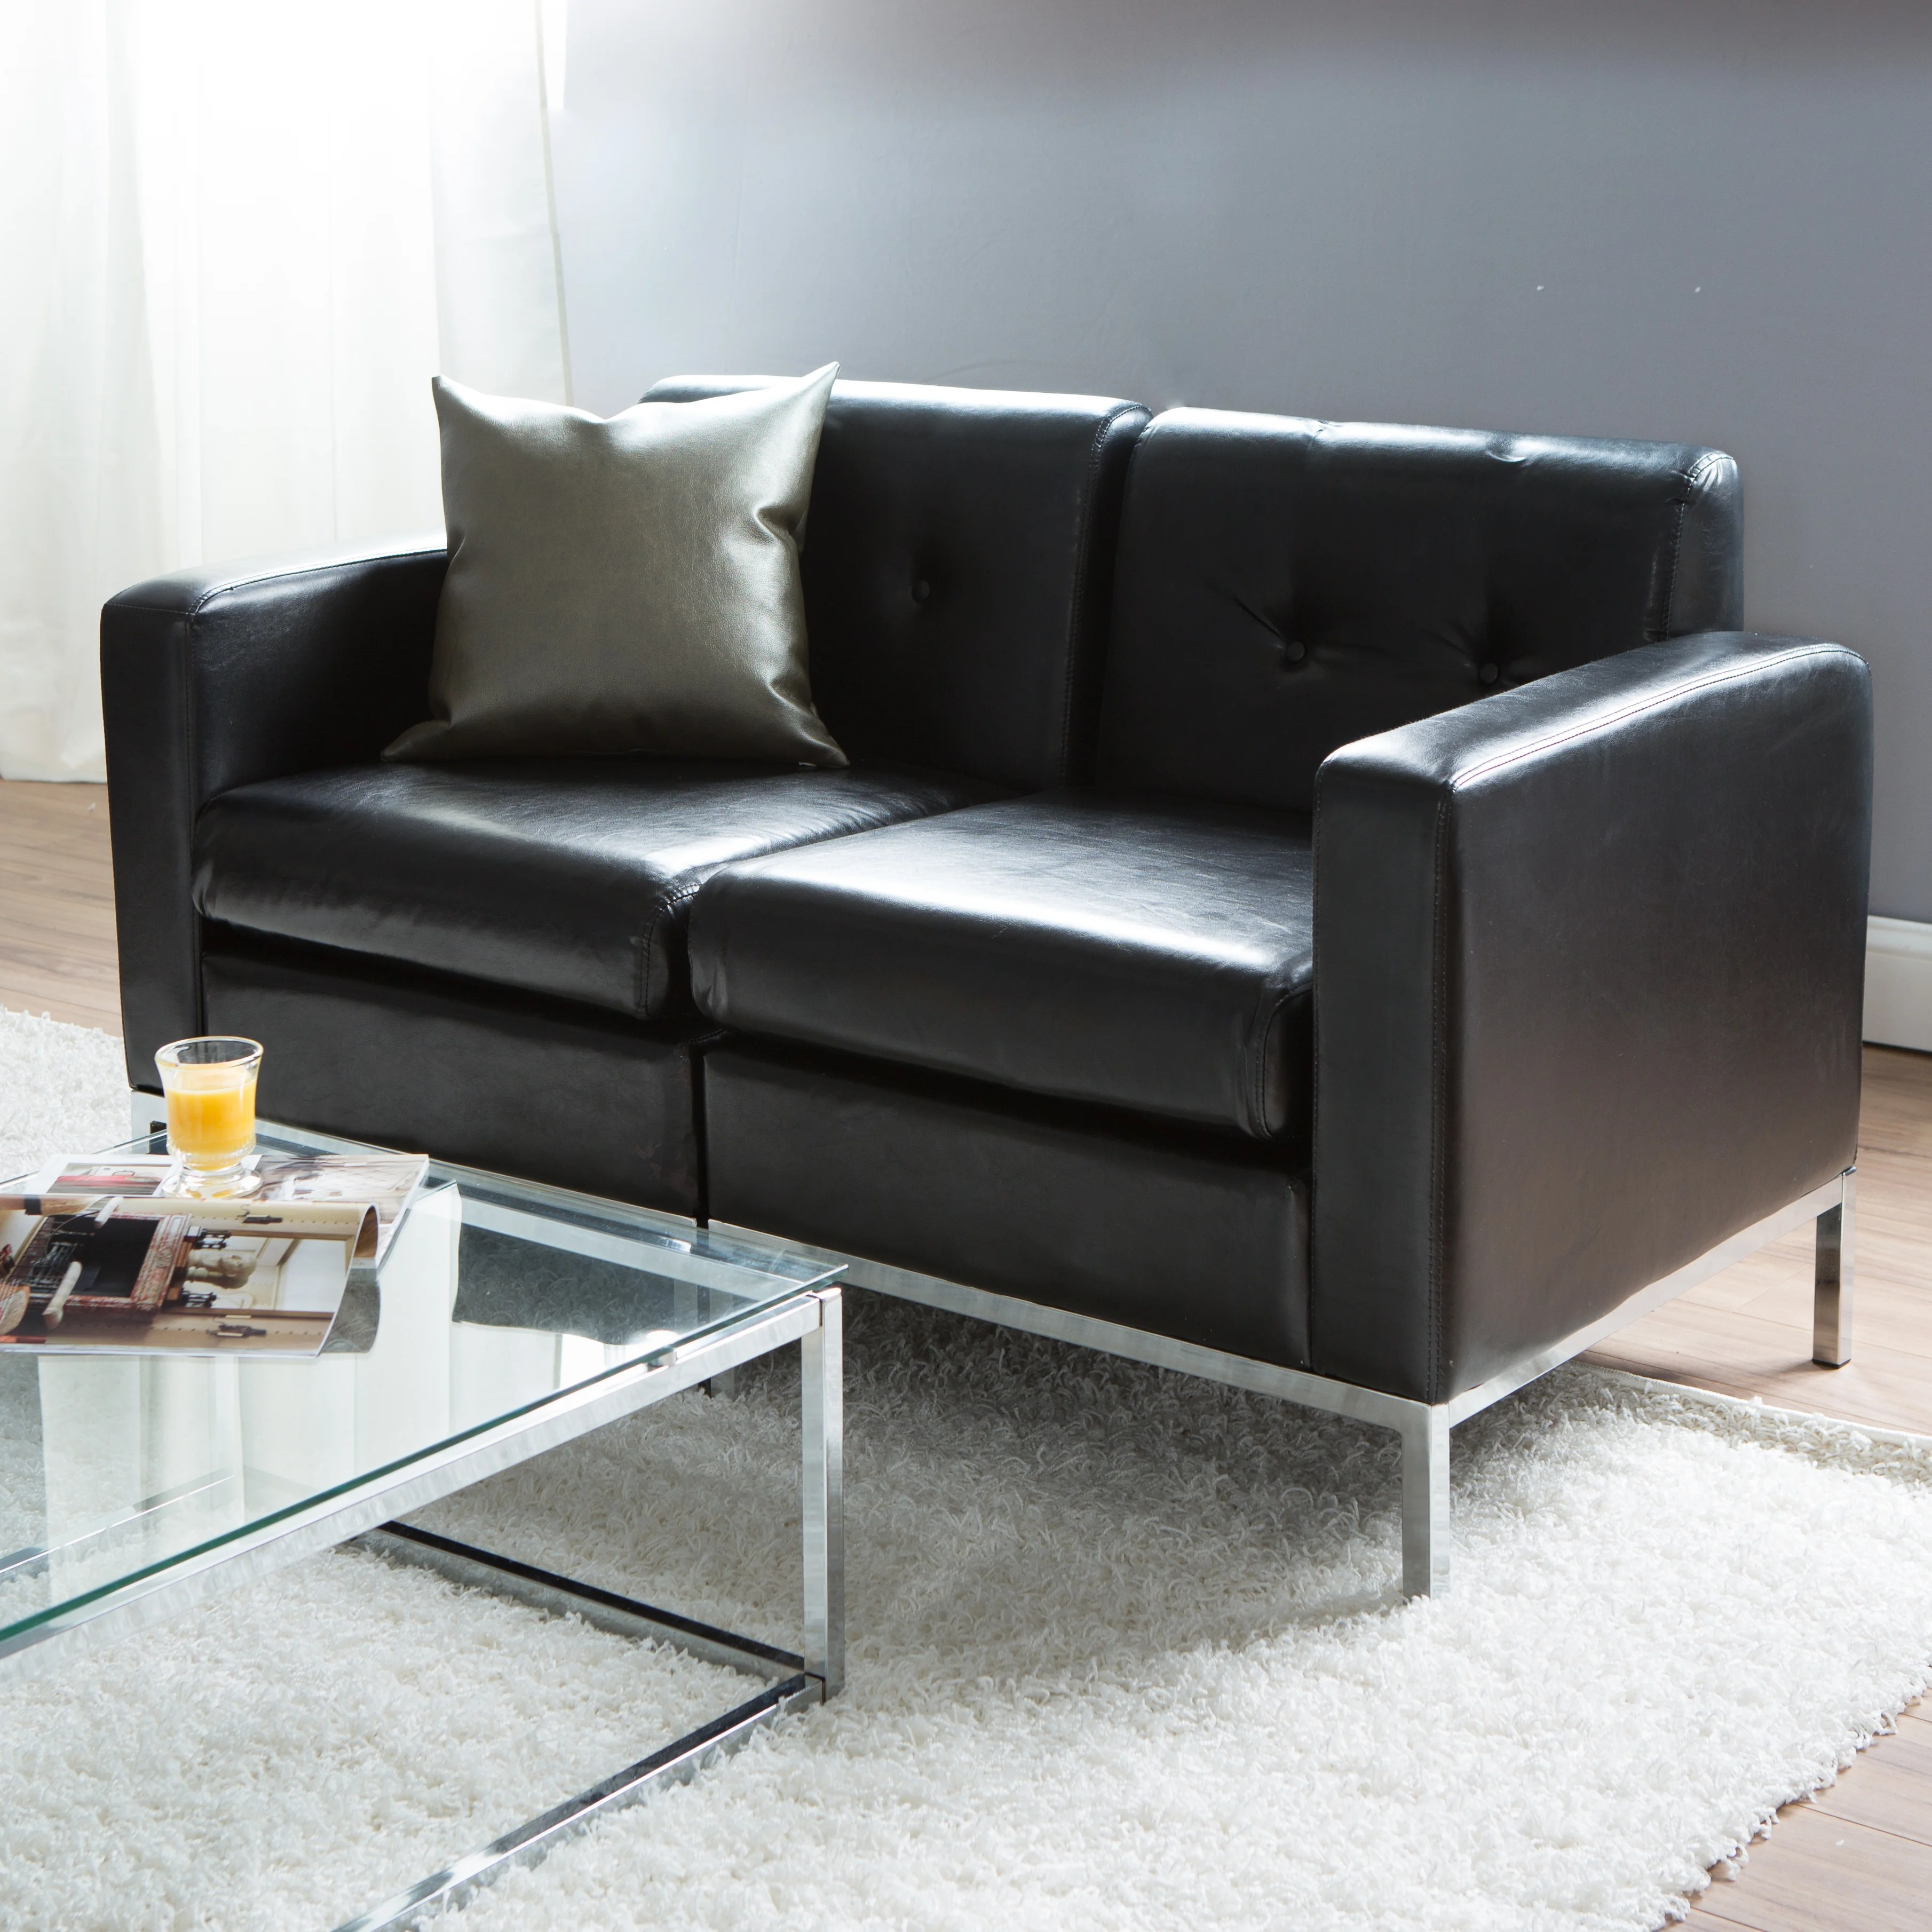 castleton sofa tatty teddy bed zipcode design modular loveseat and reviews wayfair ca